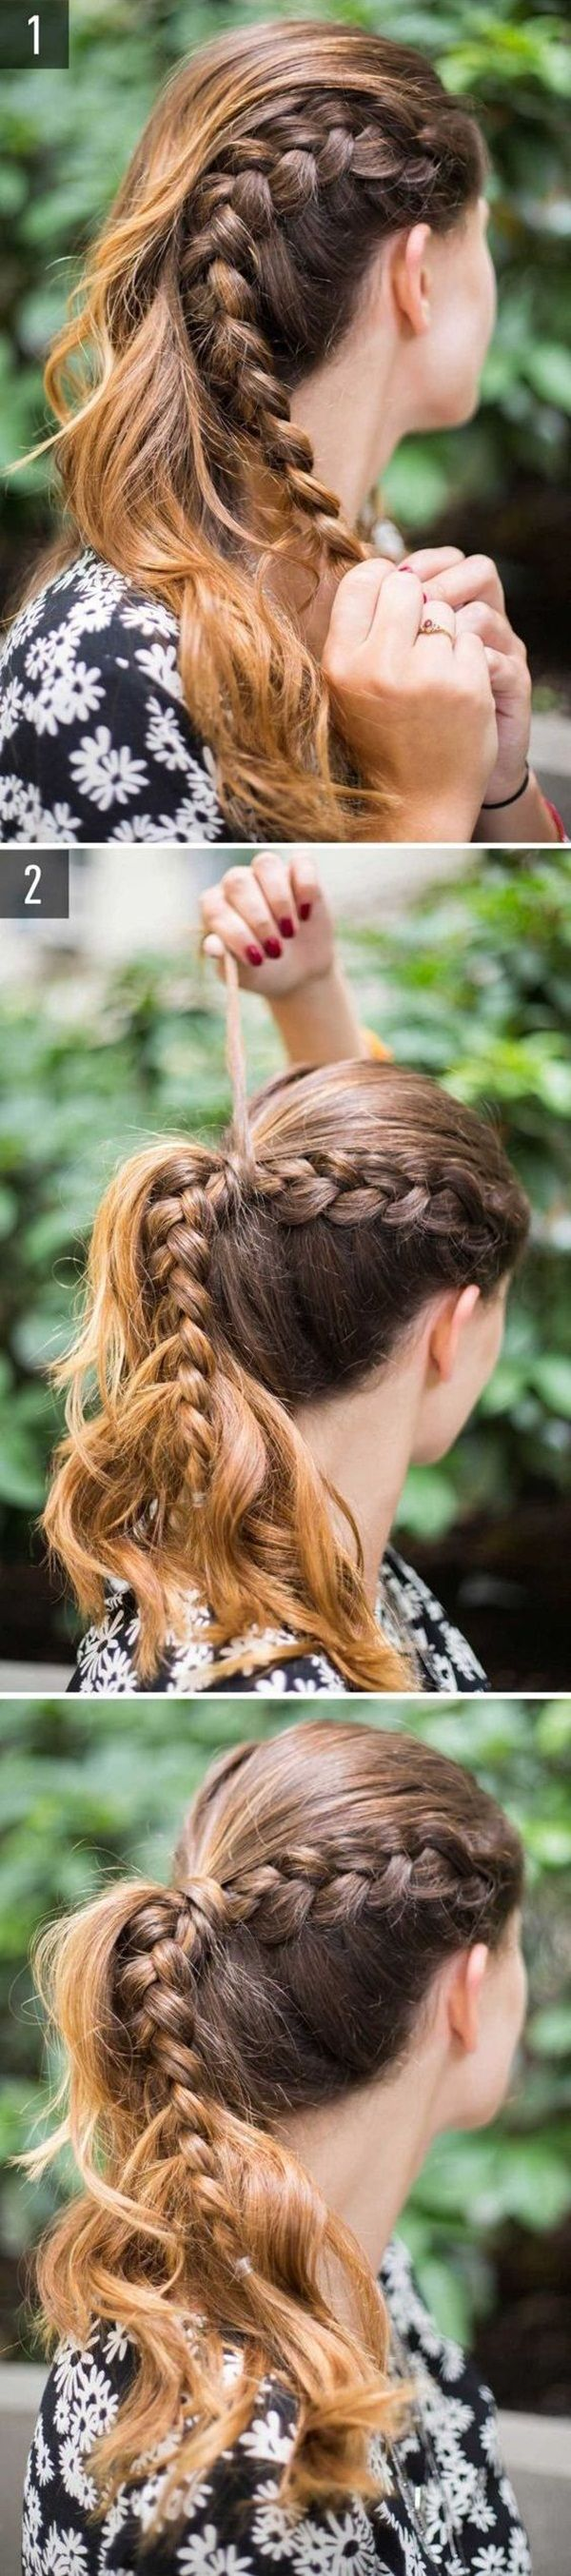 nice 40 Easy Hairstyles for Schools to Try in 2016   www.barneyfrank.n......